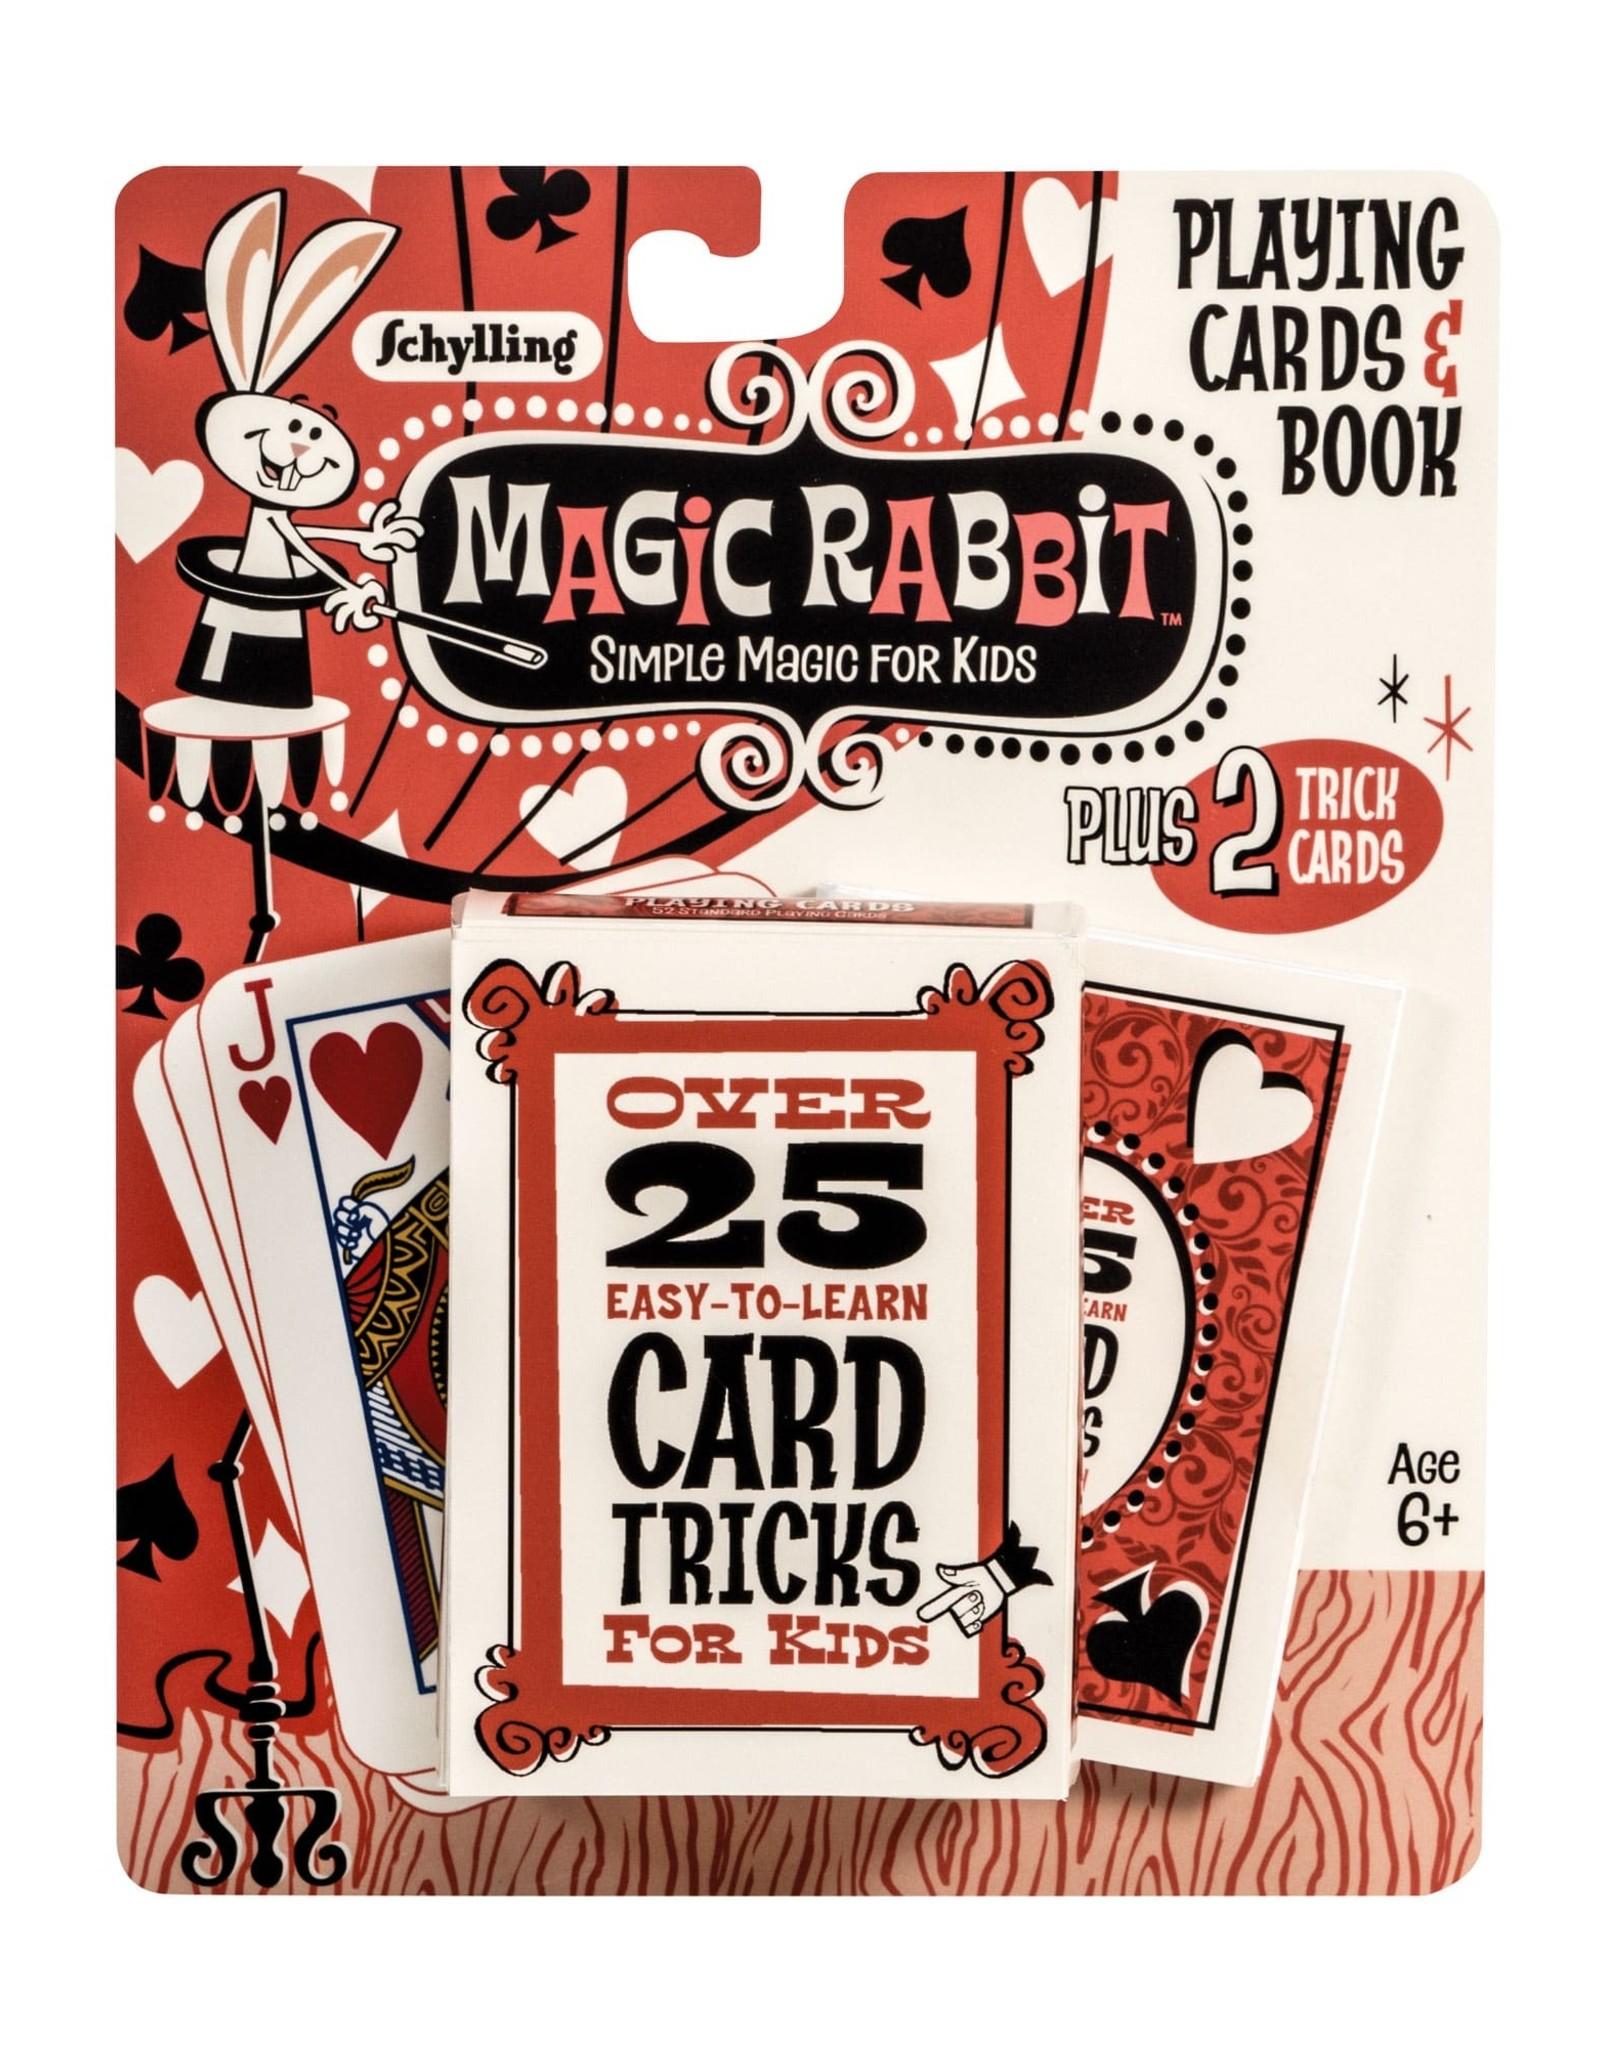 Schylling Magic Rabbit Card Tricks